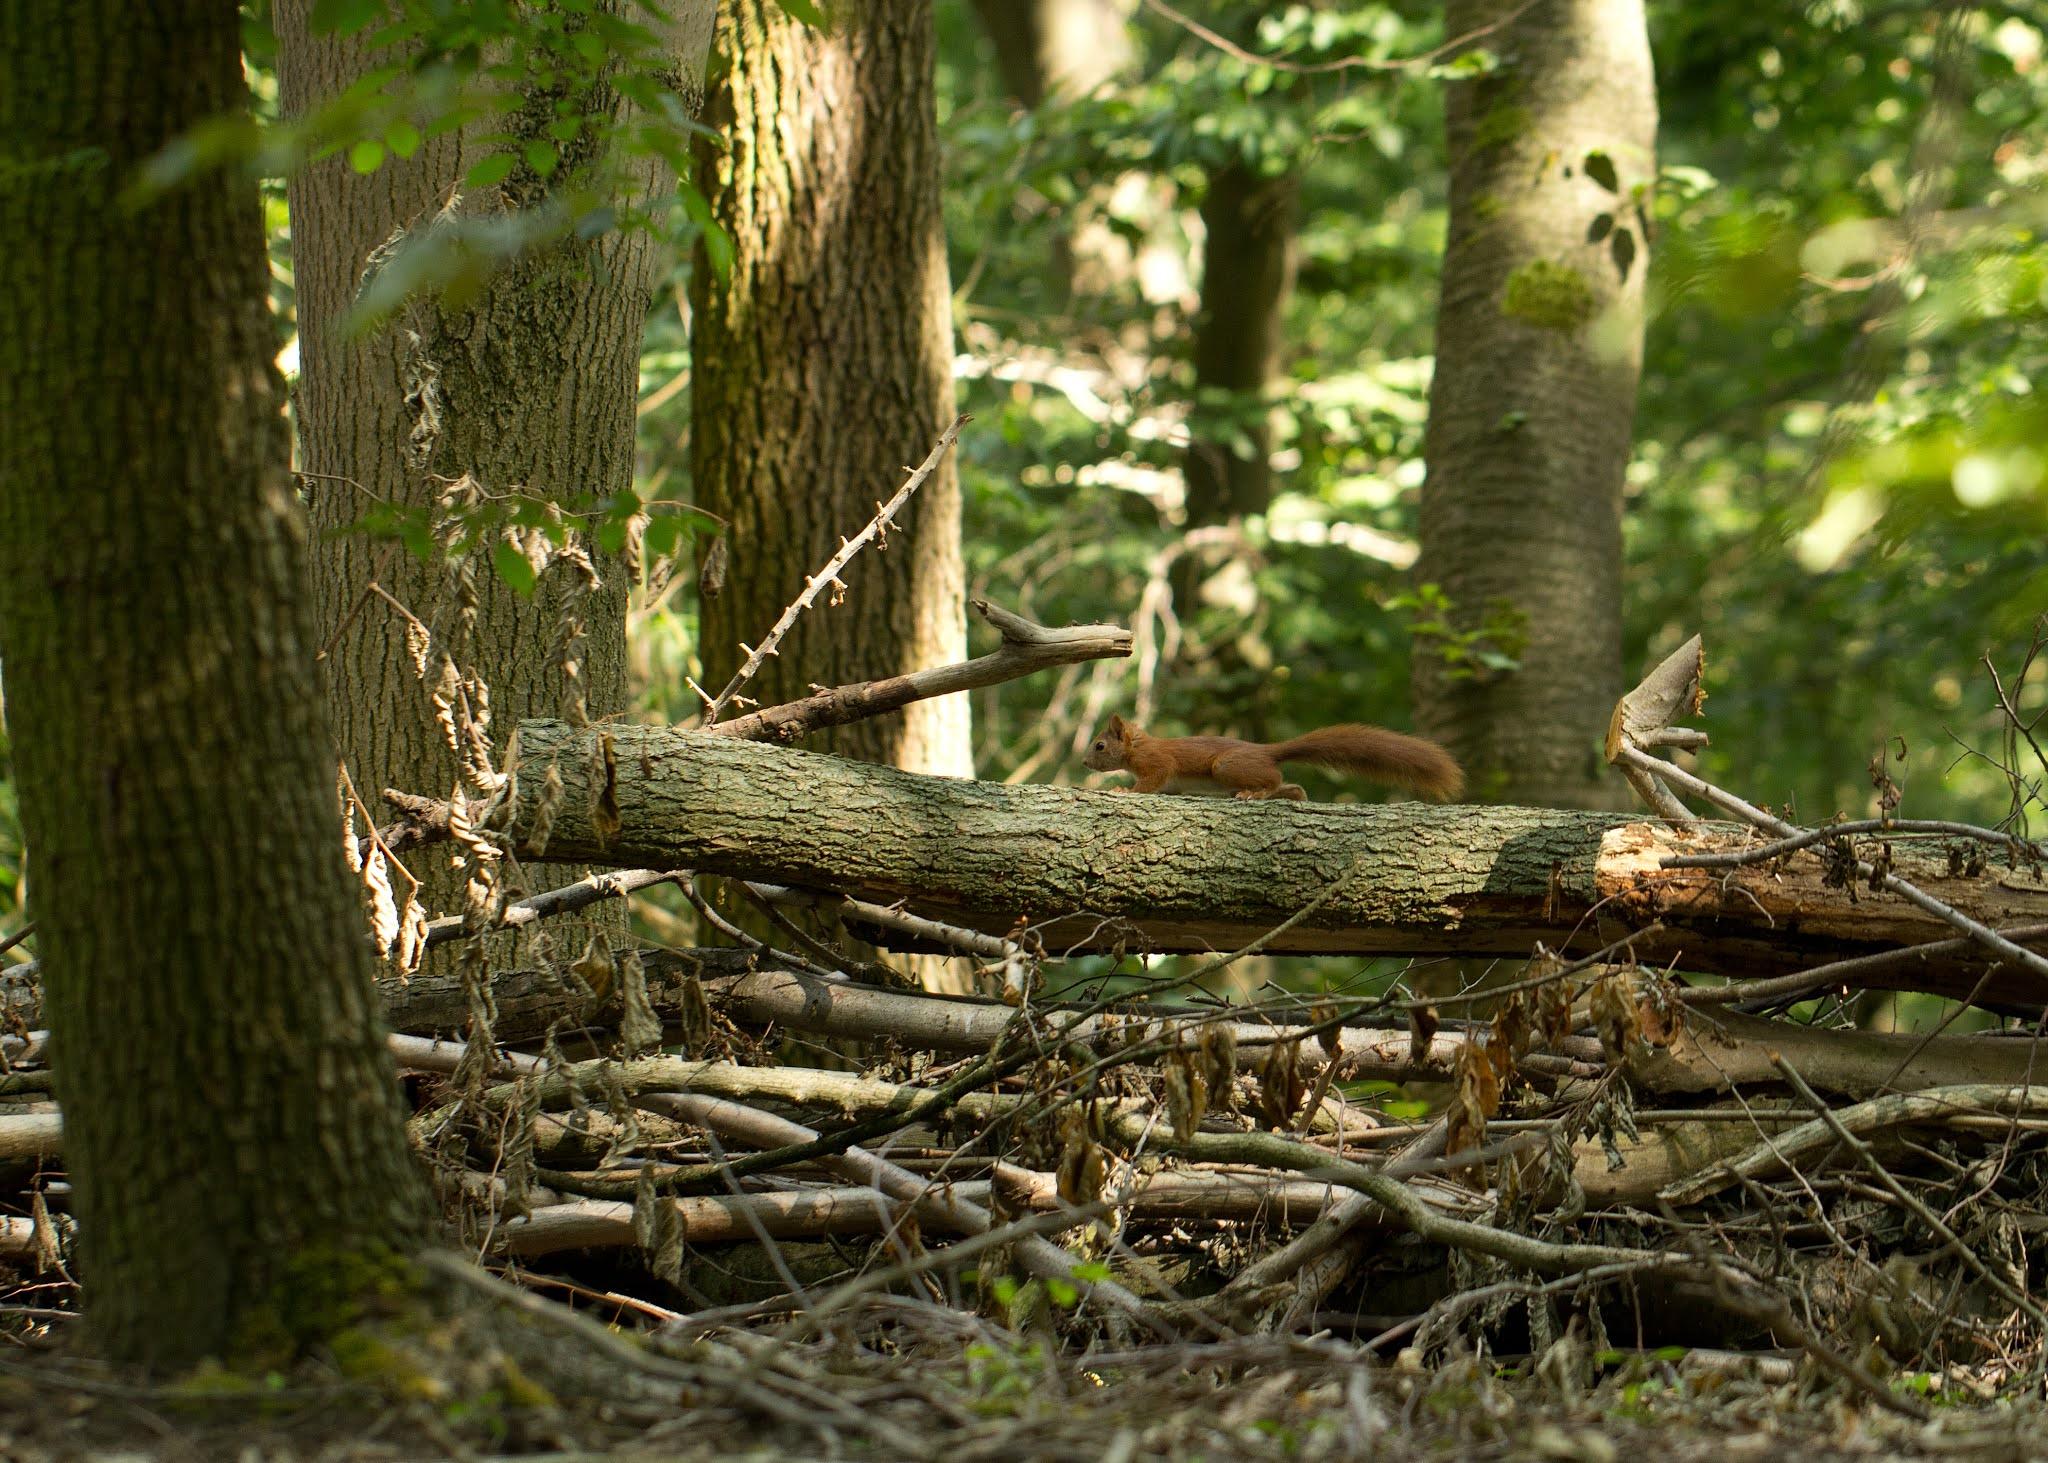 Eekhoorn, Natuurbehoud